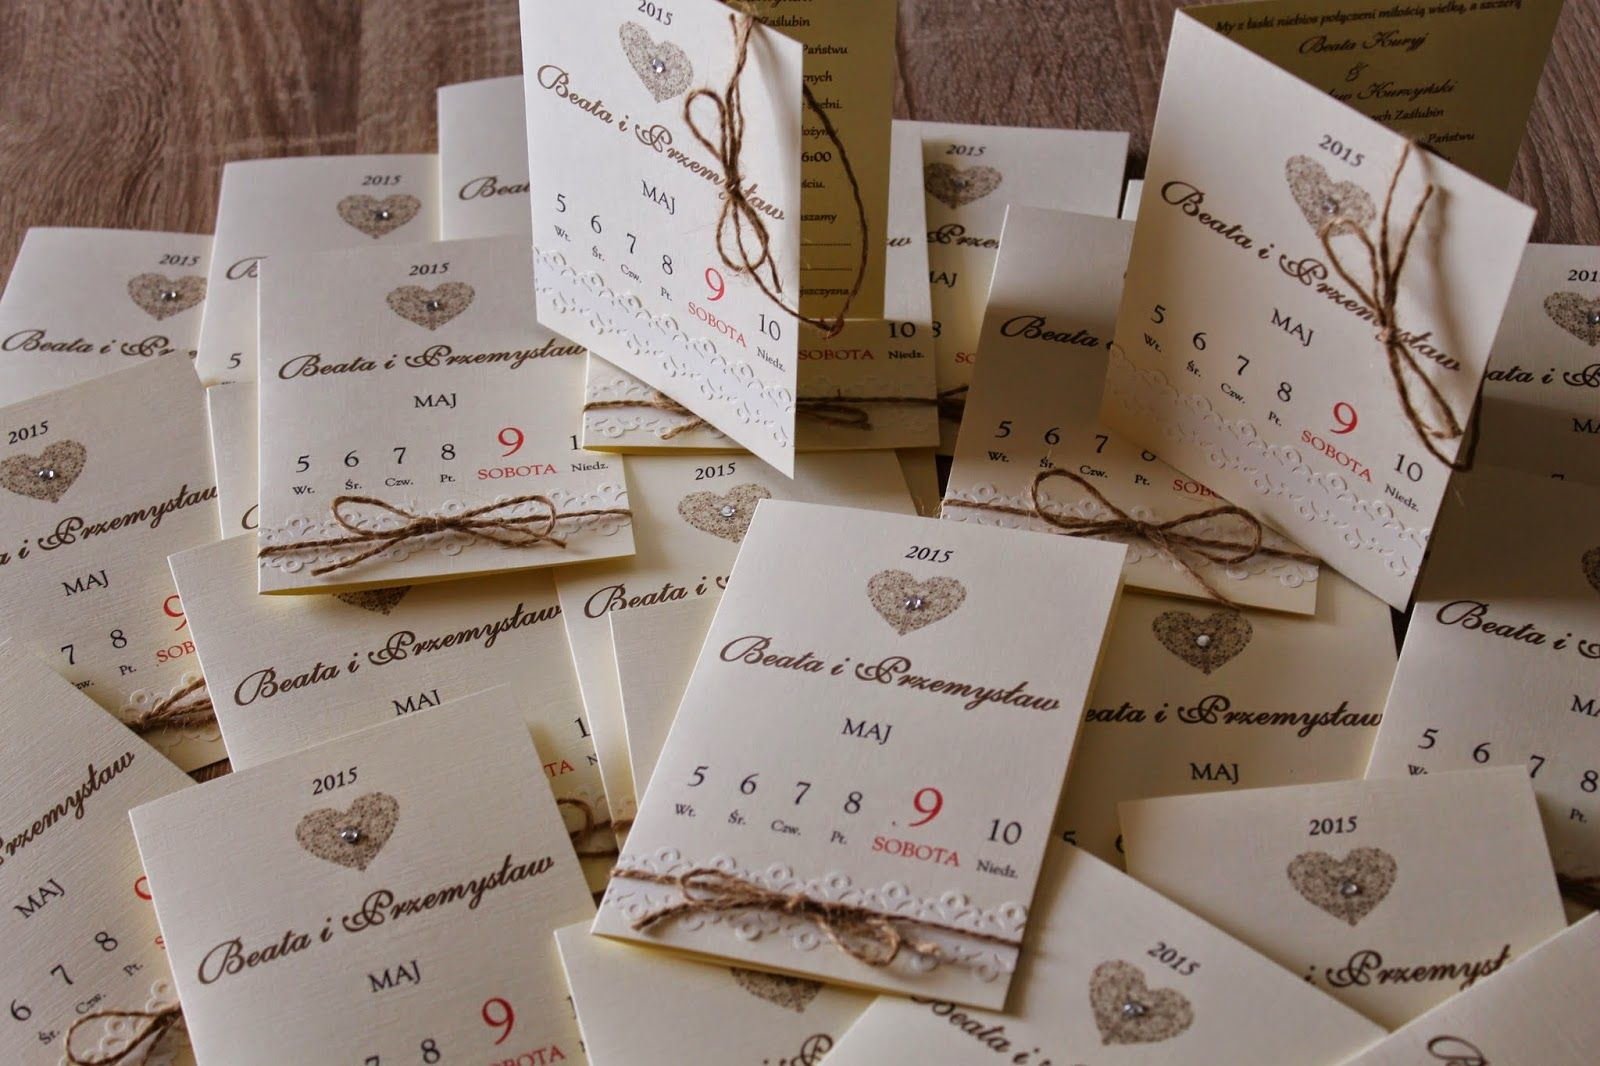 Zaproszenia Slubne Kartka Z Kalendarza Invitations Wedding Invitations Place Card Holders